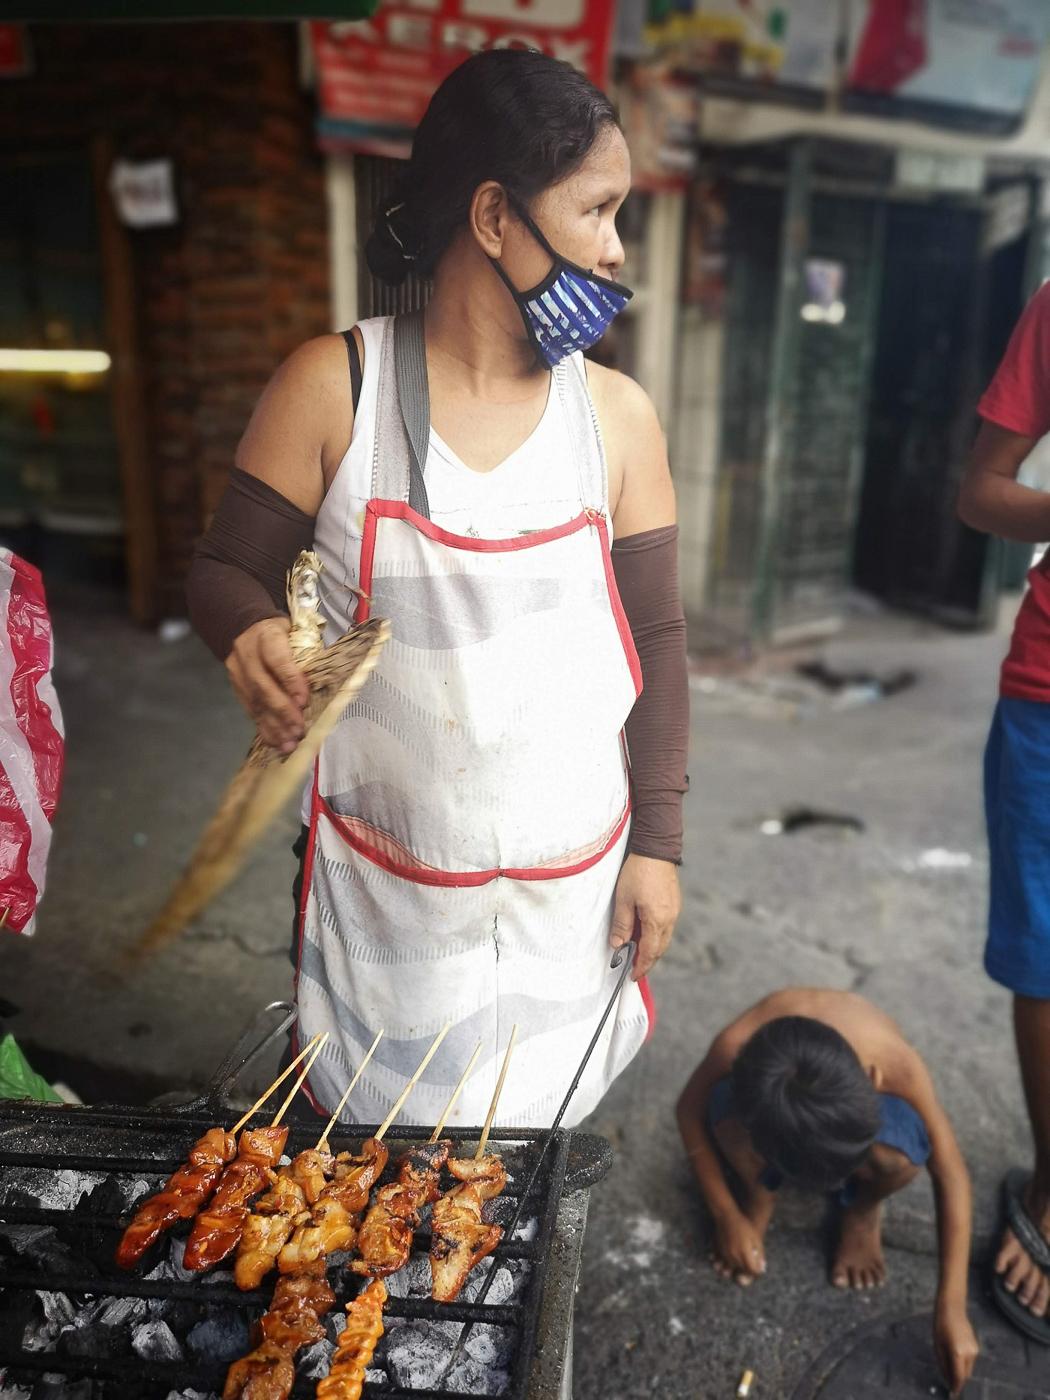 Femme grillant des brochettes philippines